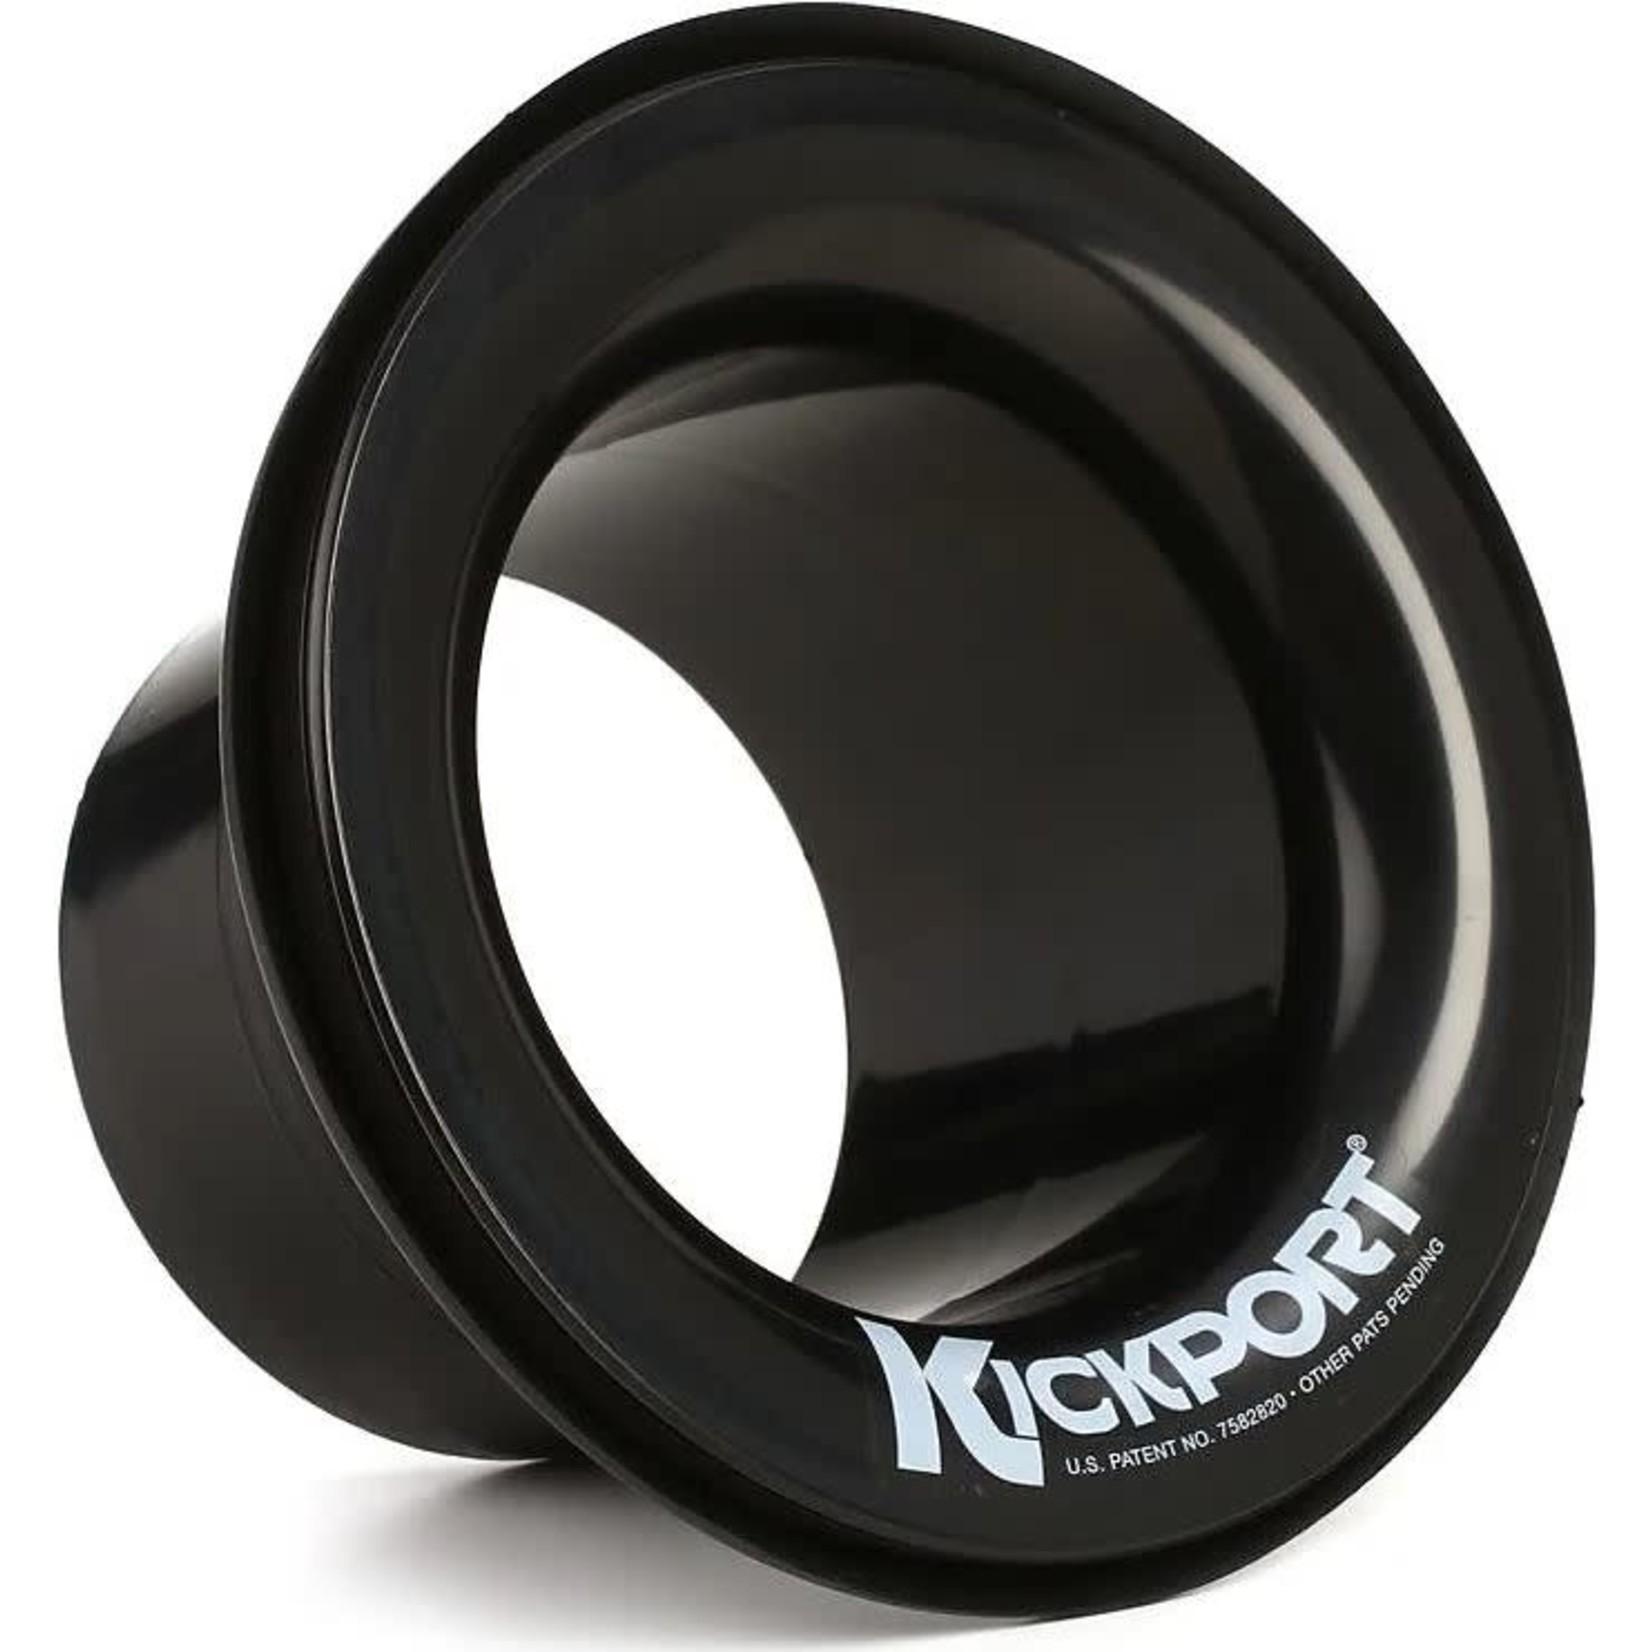 Kickport KICKPORT SOUND ENHANCER BLACK KP001